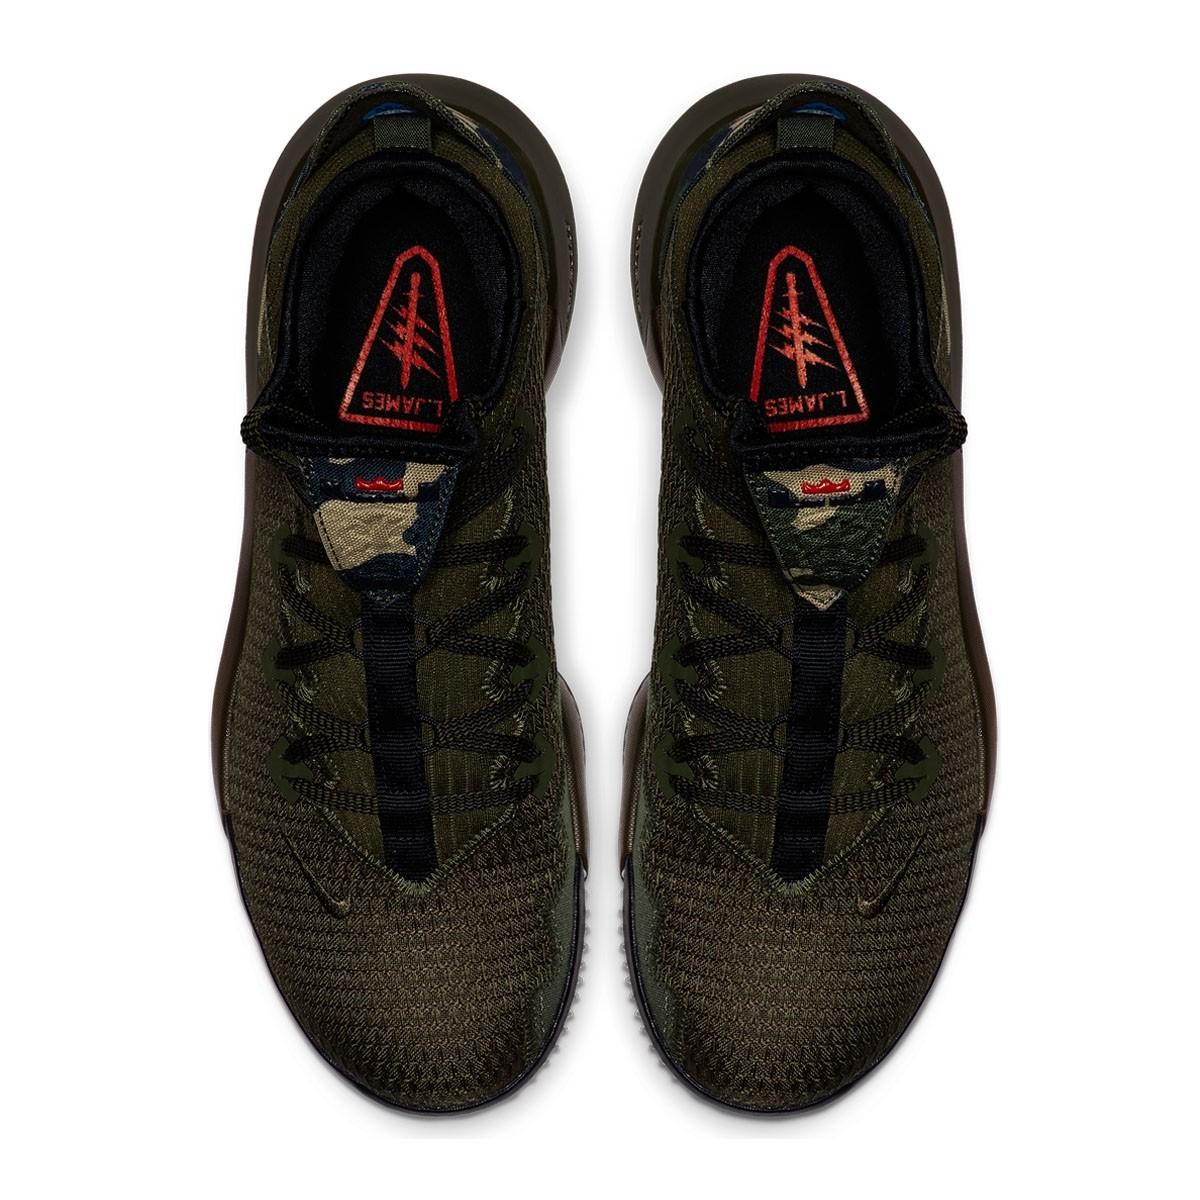 Nike Lebron XVI Low 'Camo' CI2668-300